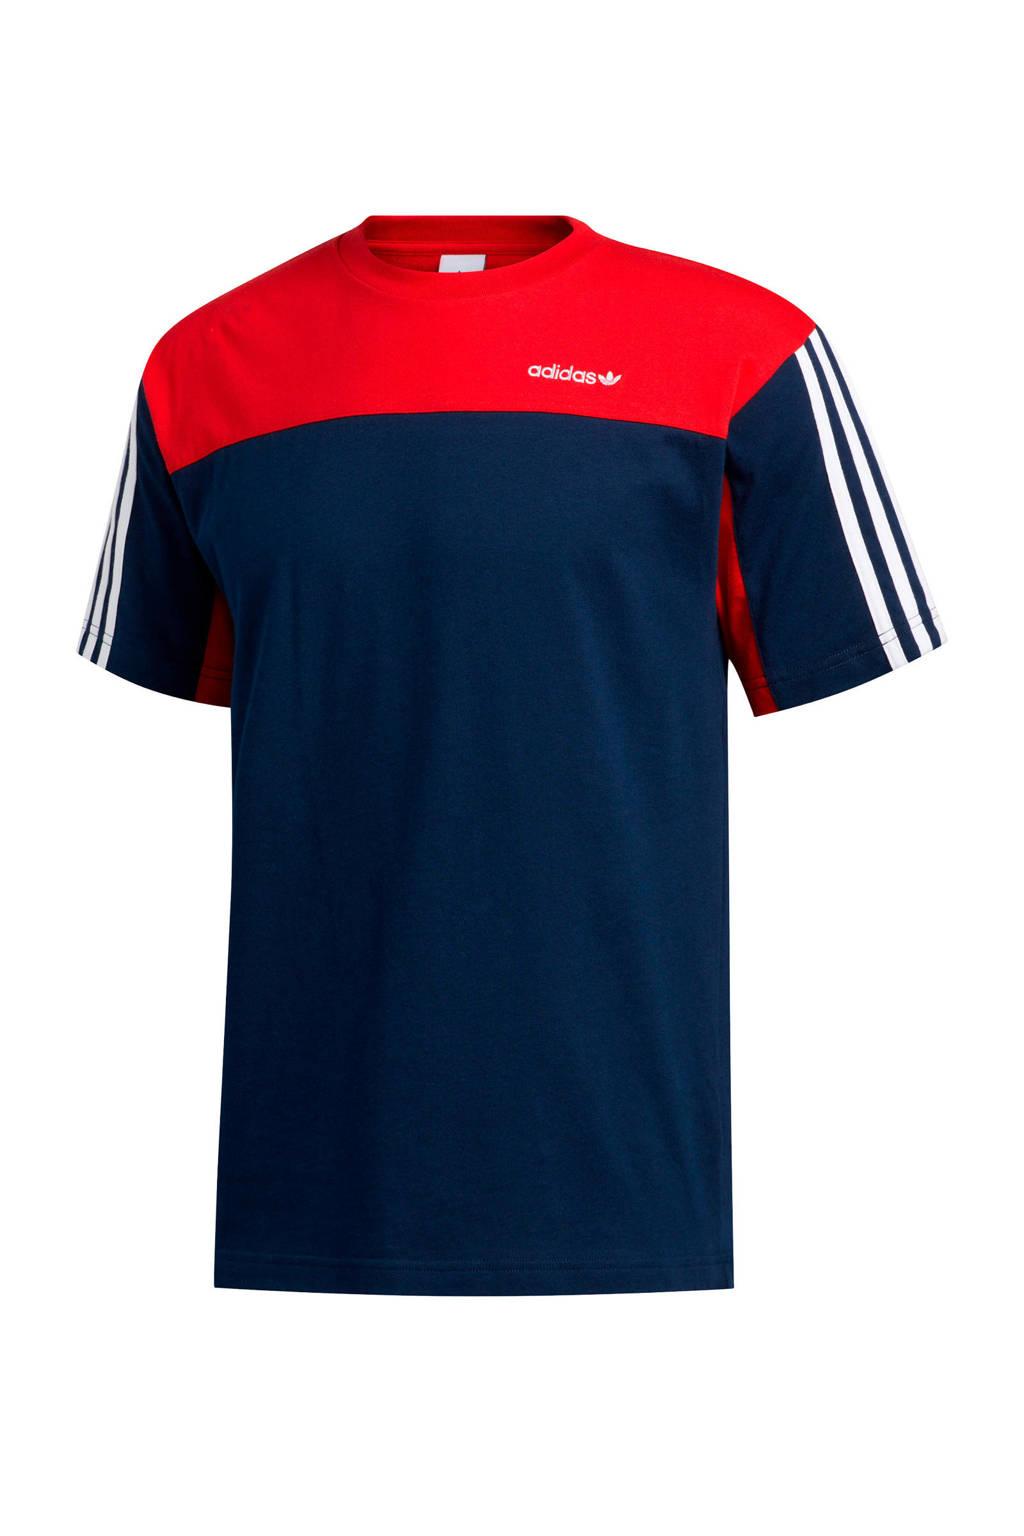 adidas Originals T-shirt donkerblauw/rood, Donkerblauw/rood